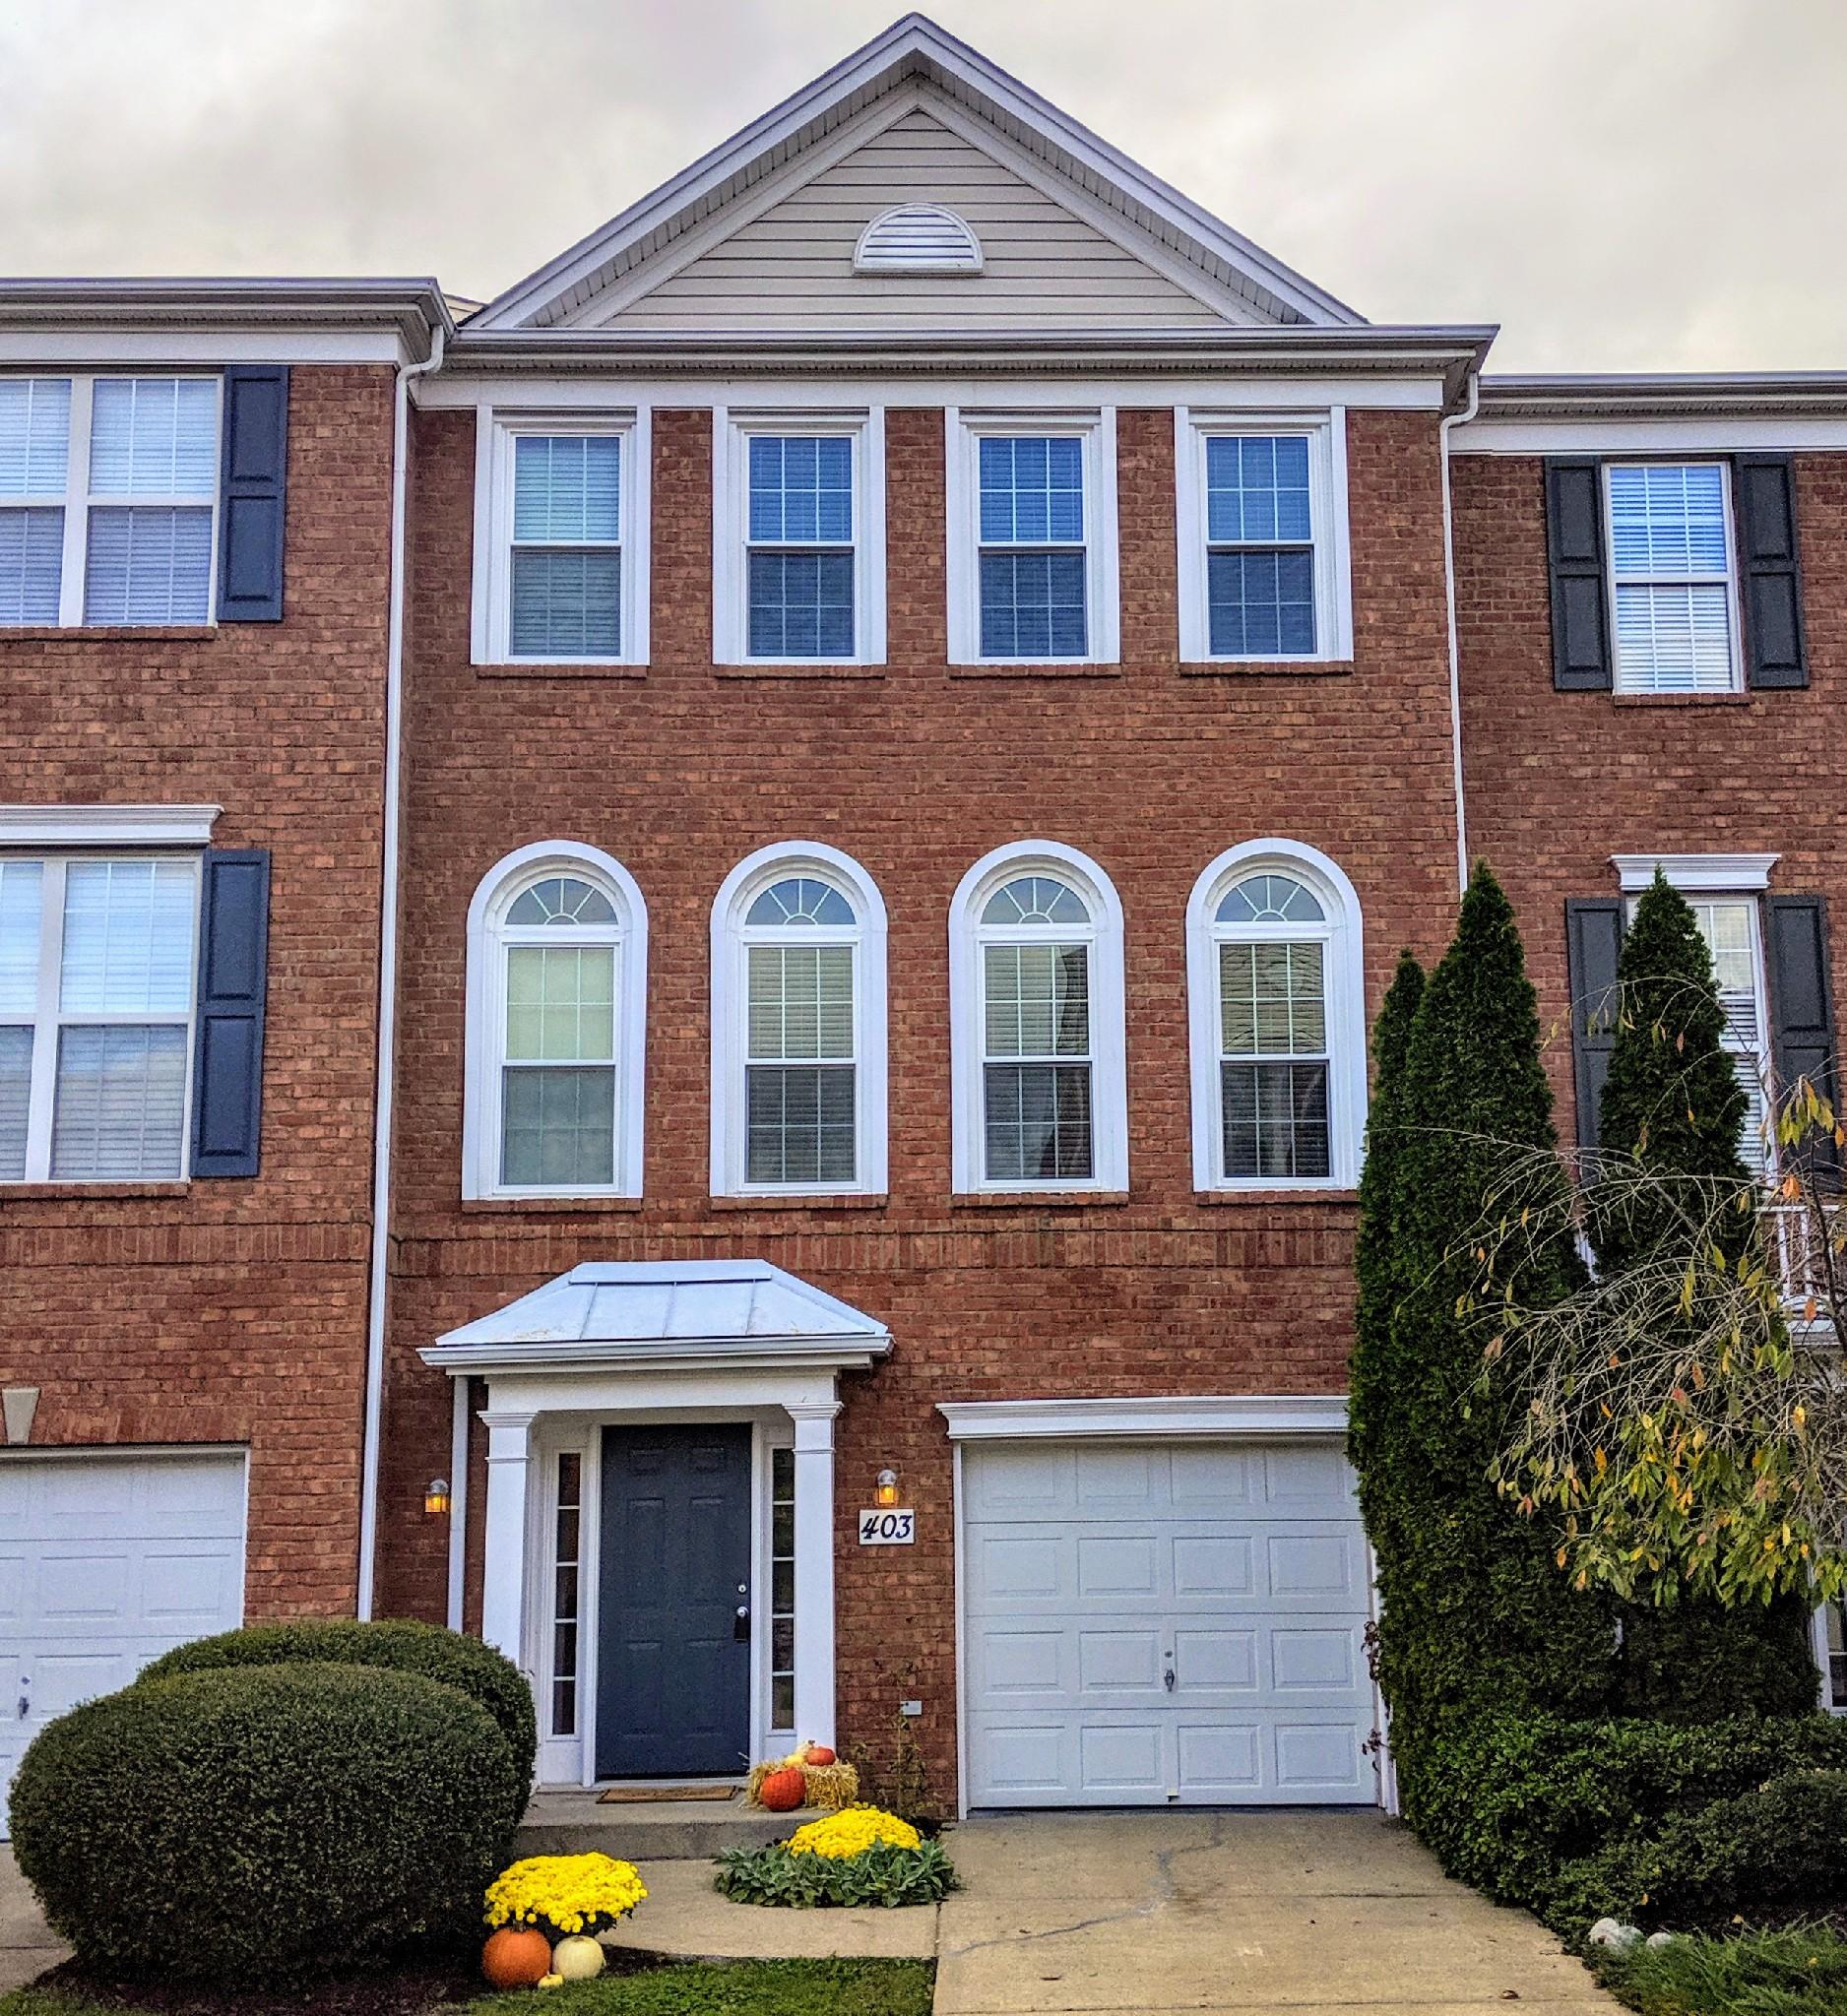 7252 Highway 70, S, Nashville, TN 37221 - Nashville, TN real estate listing